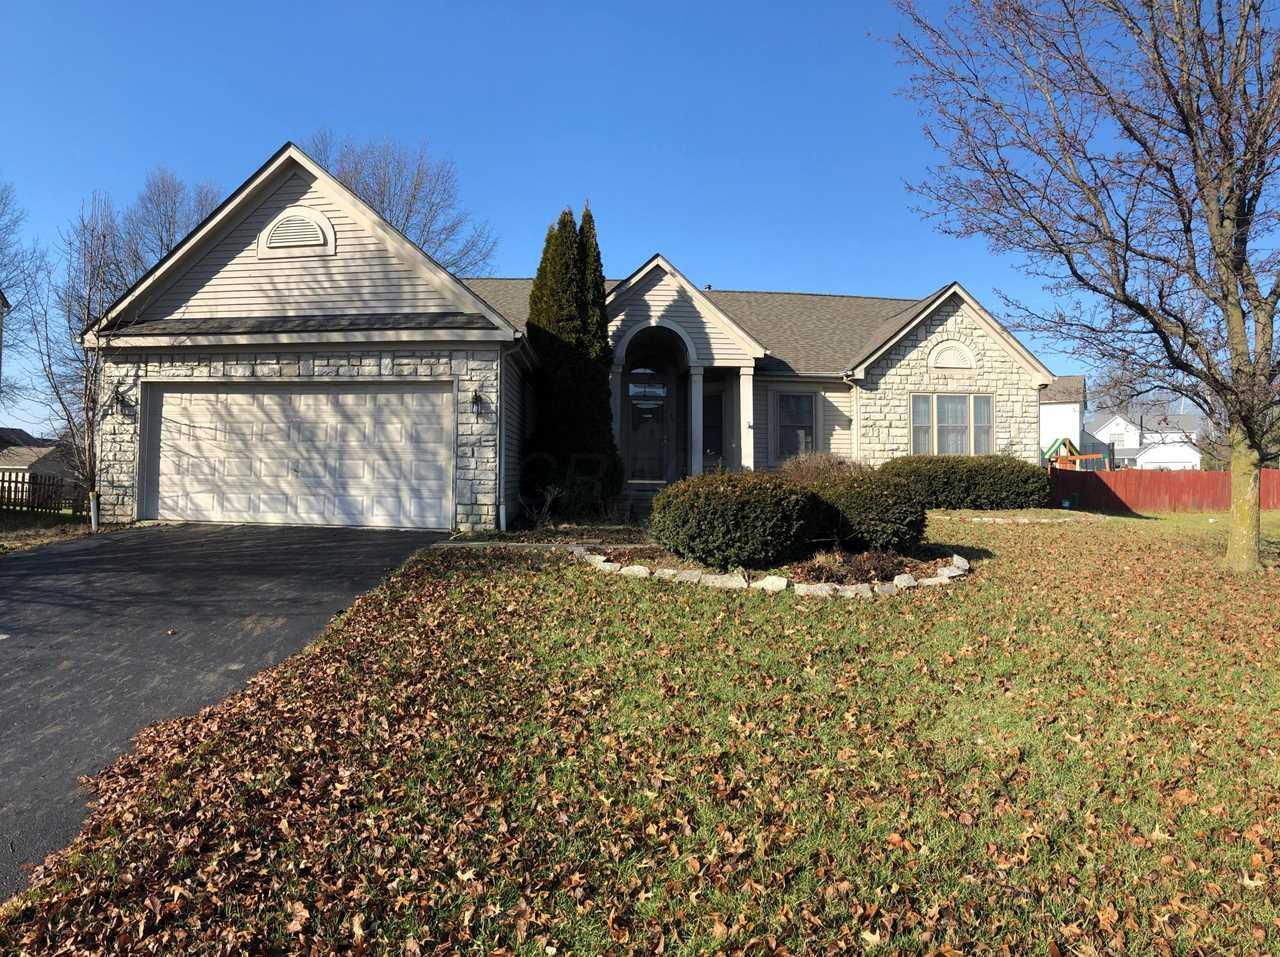 701 Petigrew Drive Reynoldsburg, OH 43068   MLS 219000410 Photo 1